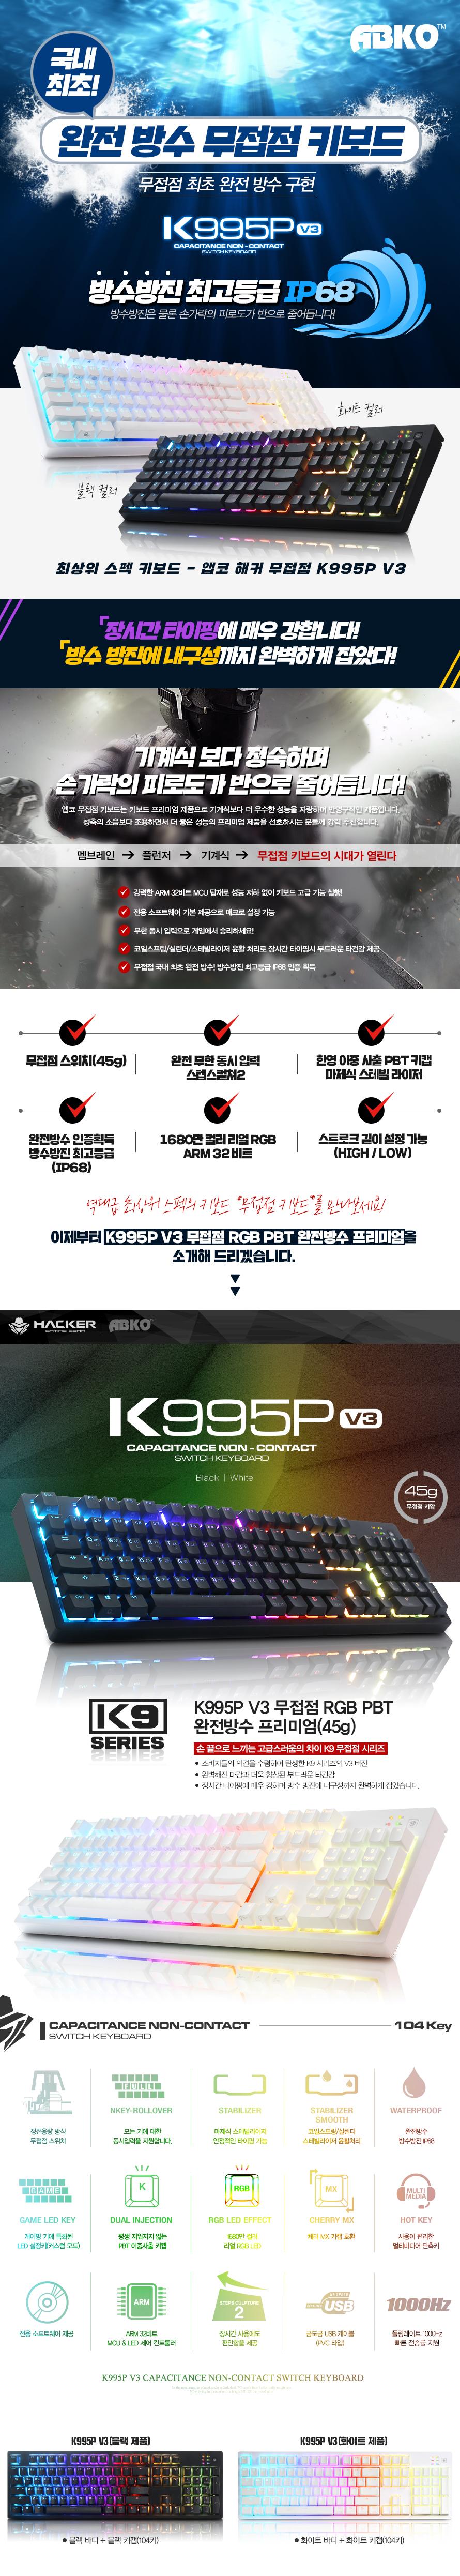 ABKO HACKER K995P V3 RGB PBT 무접점 (블랙)